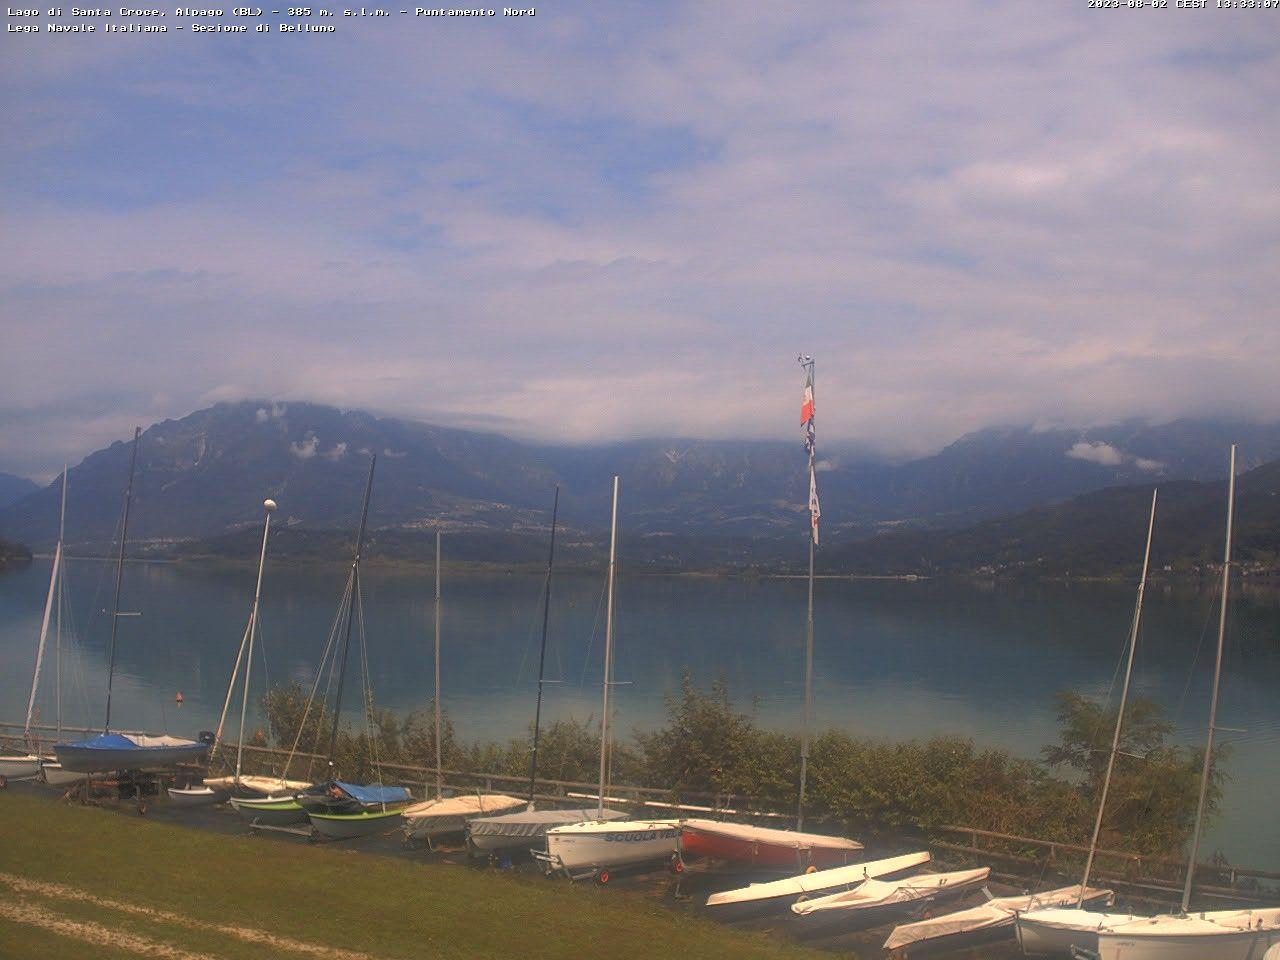 Webcam Alpago am Lago di Santa Croce - Lega Navale Belluno